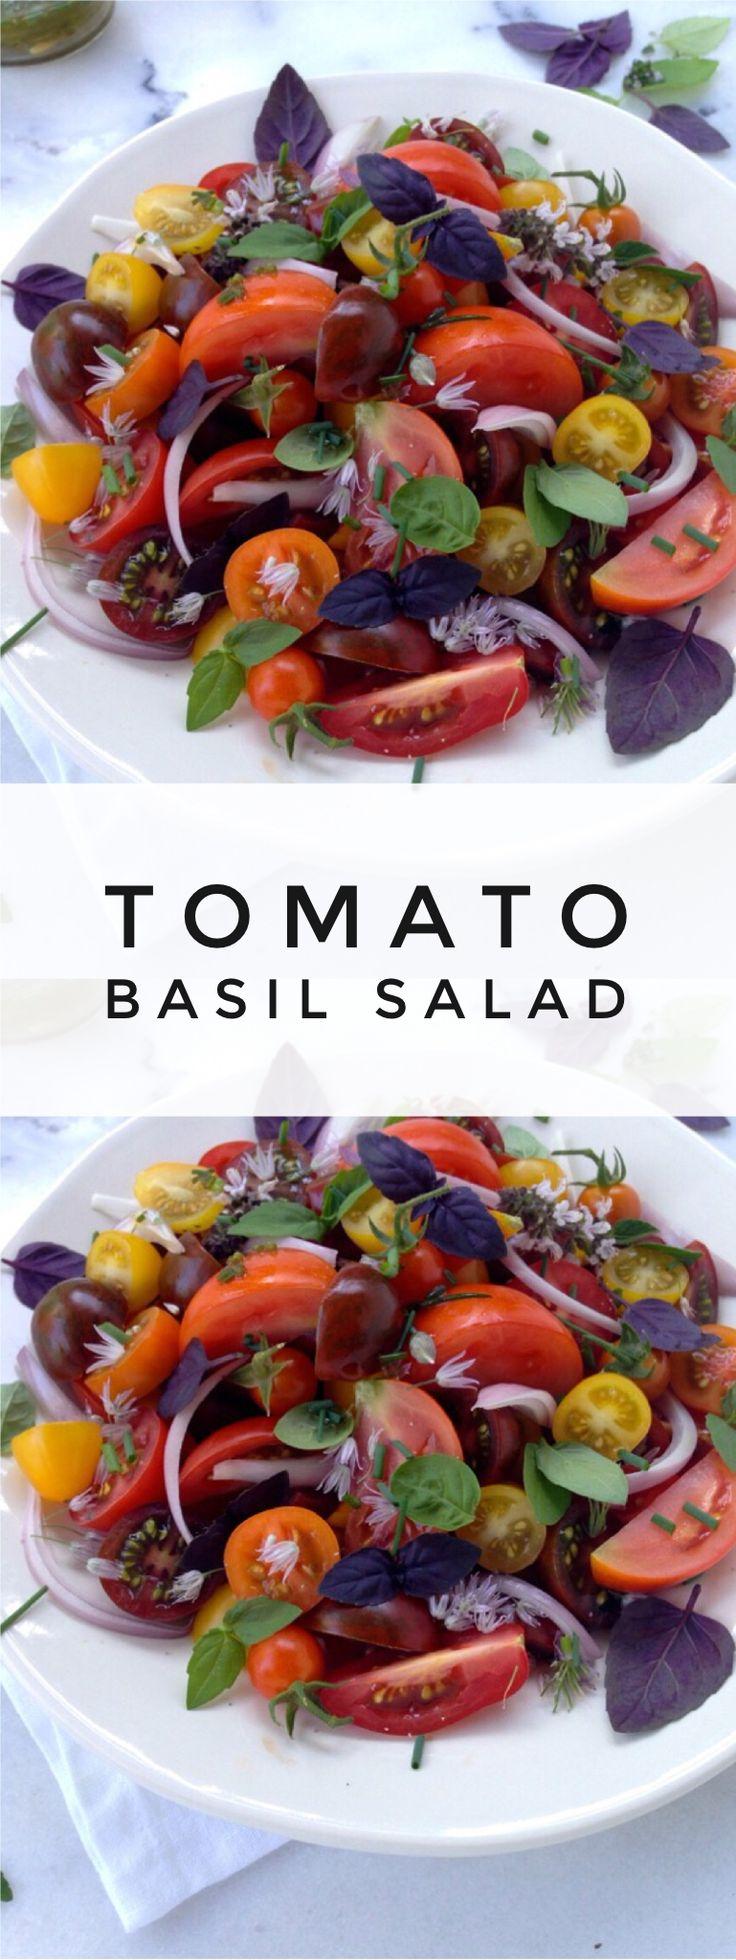 Tomato Basil Salad with Chive Vinaigrette Recipe | CiaoFlorentina.com @CiaoFlorentina